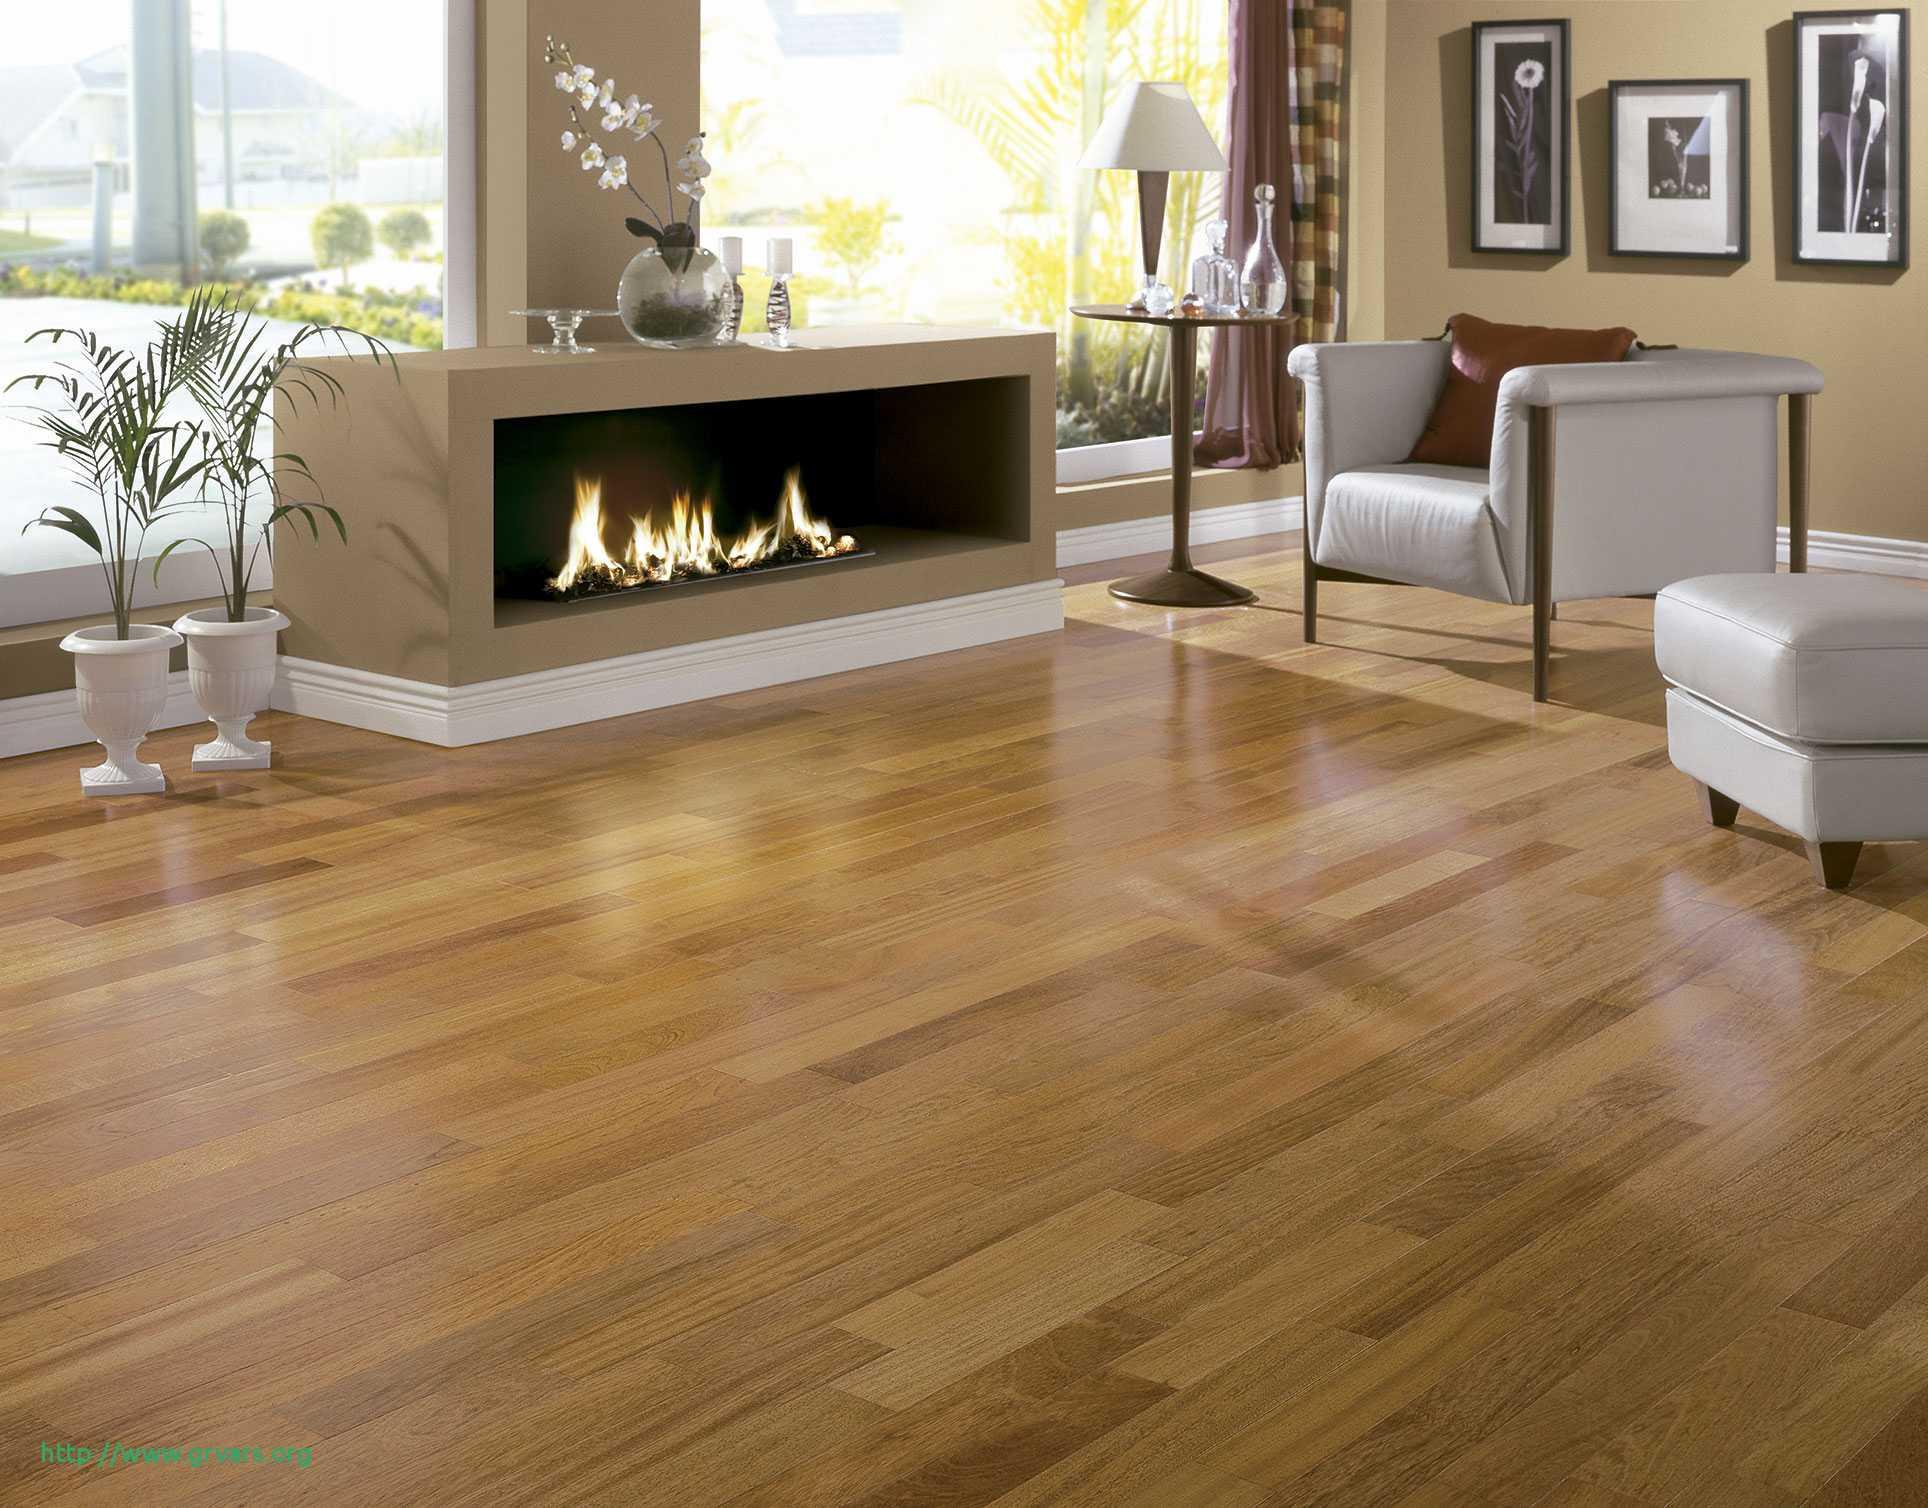 cheap hardwood flooring gta of 21 beau cheapest hardwood flooring in toronto ideas blog within cheapest hardwood flooring in toronto unique fabulous discount hardwood flooring 0 floor brampton 25 toronto